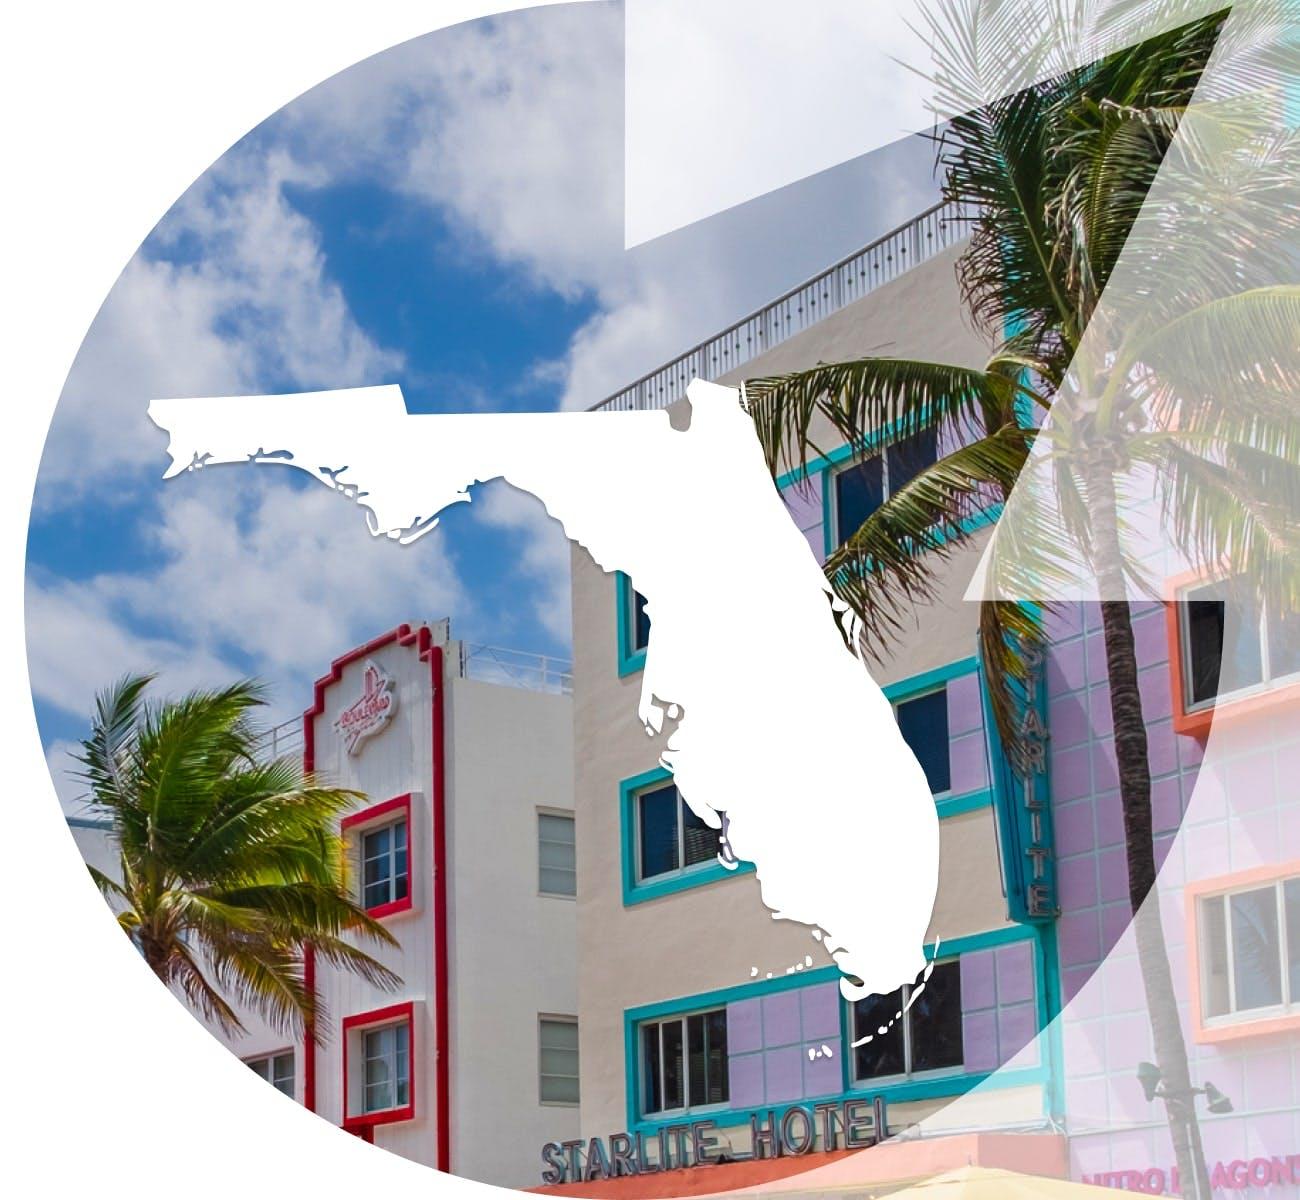 Florida!